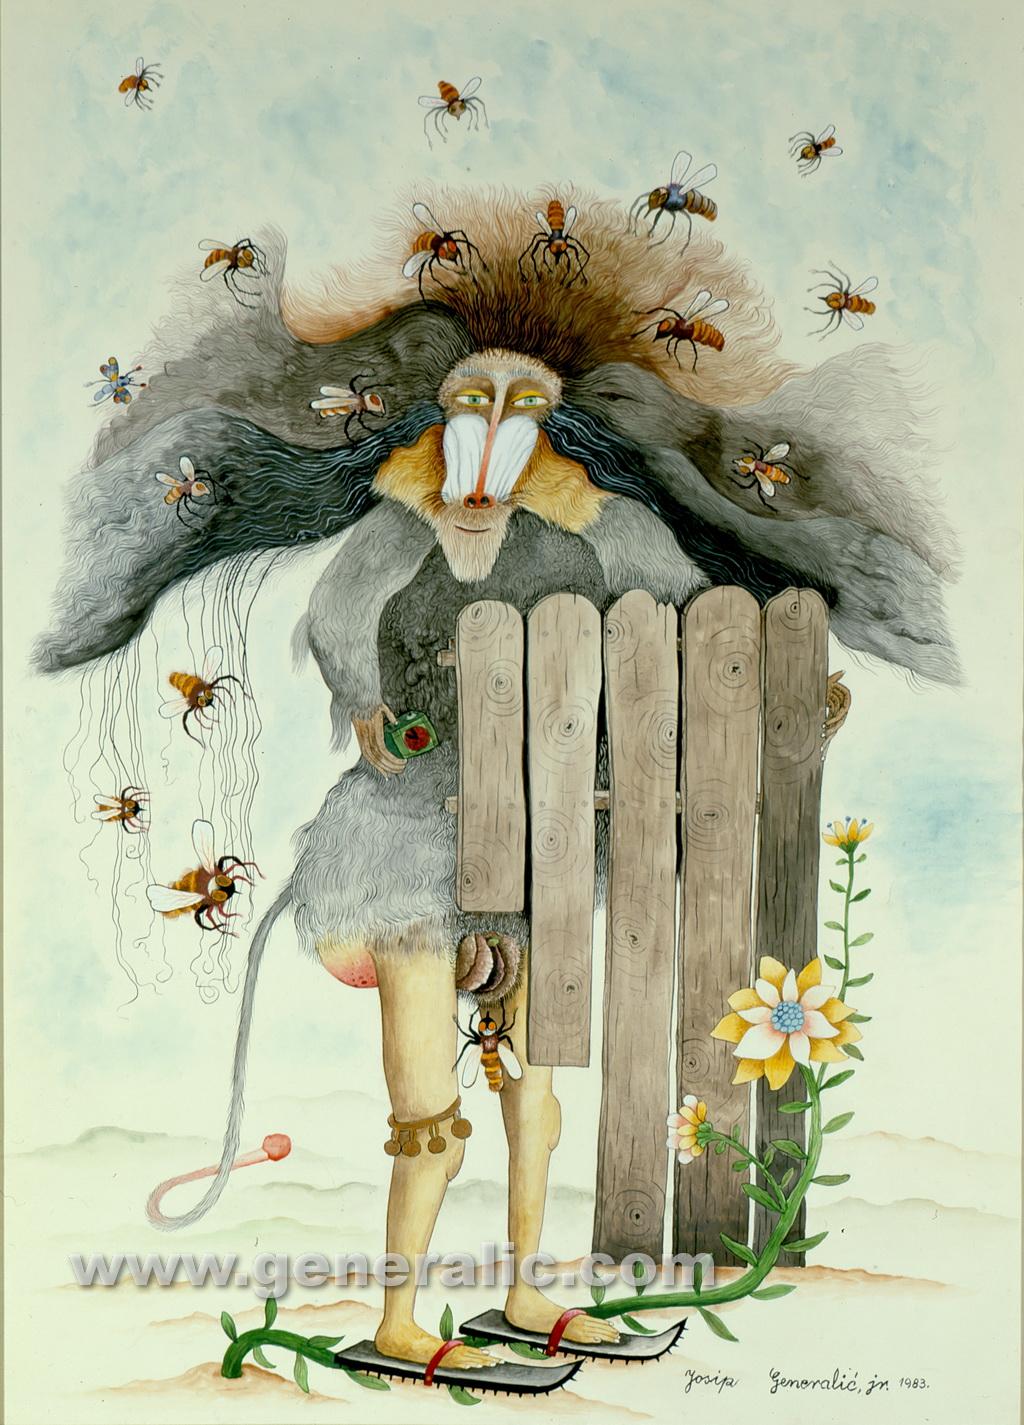 Josip Generalic, 1983, Ugliness alergic to bees, watercolour